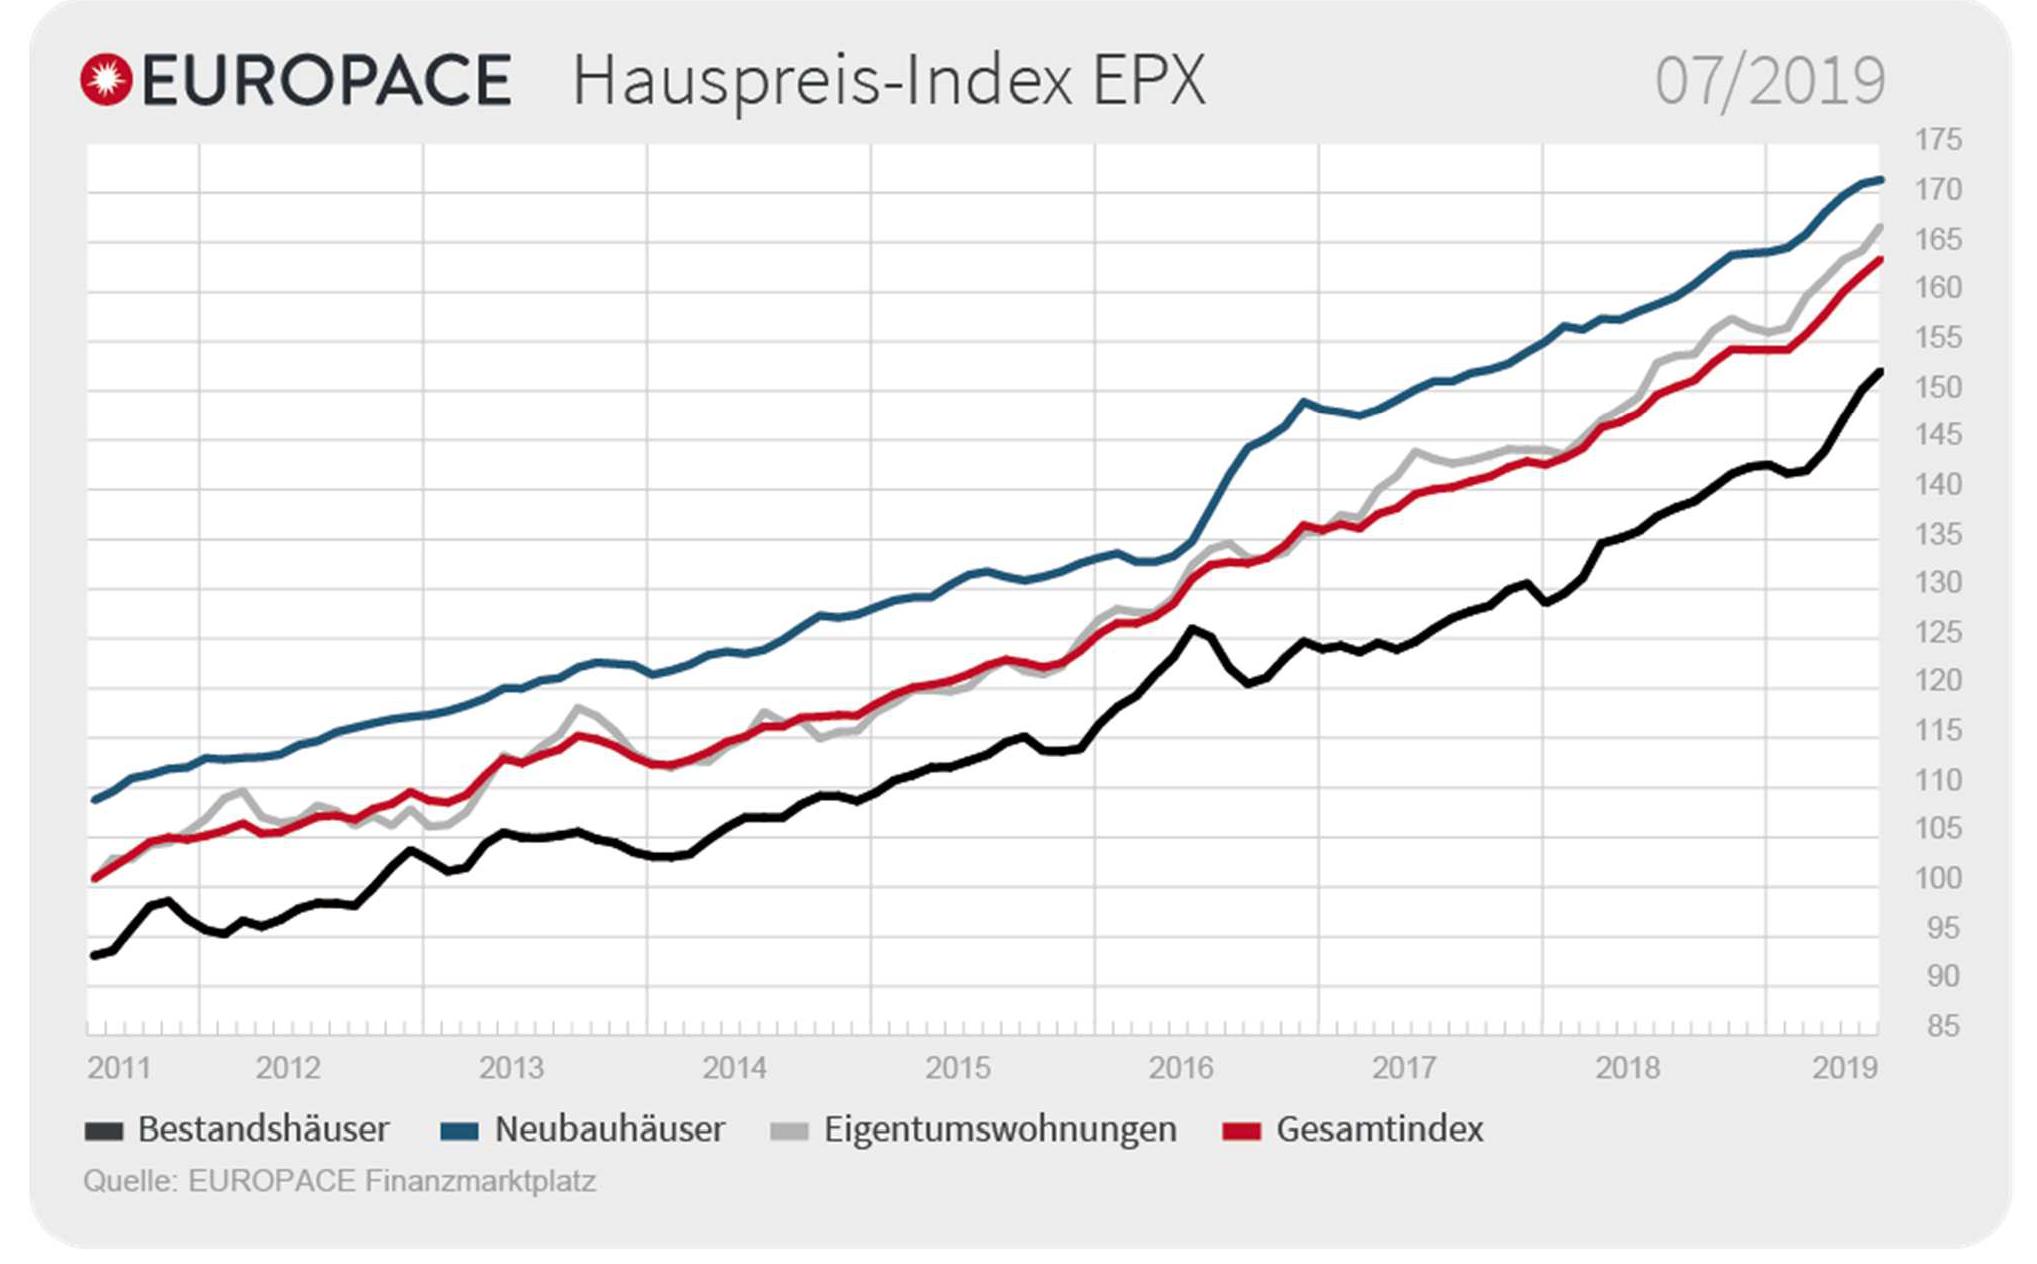 Hauspreis-Index EPX 07/2019